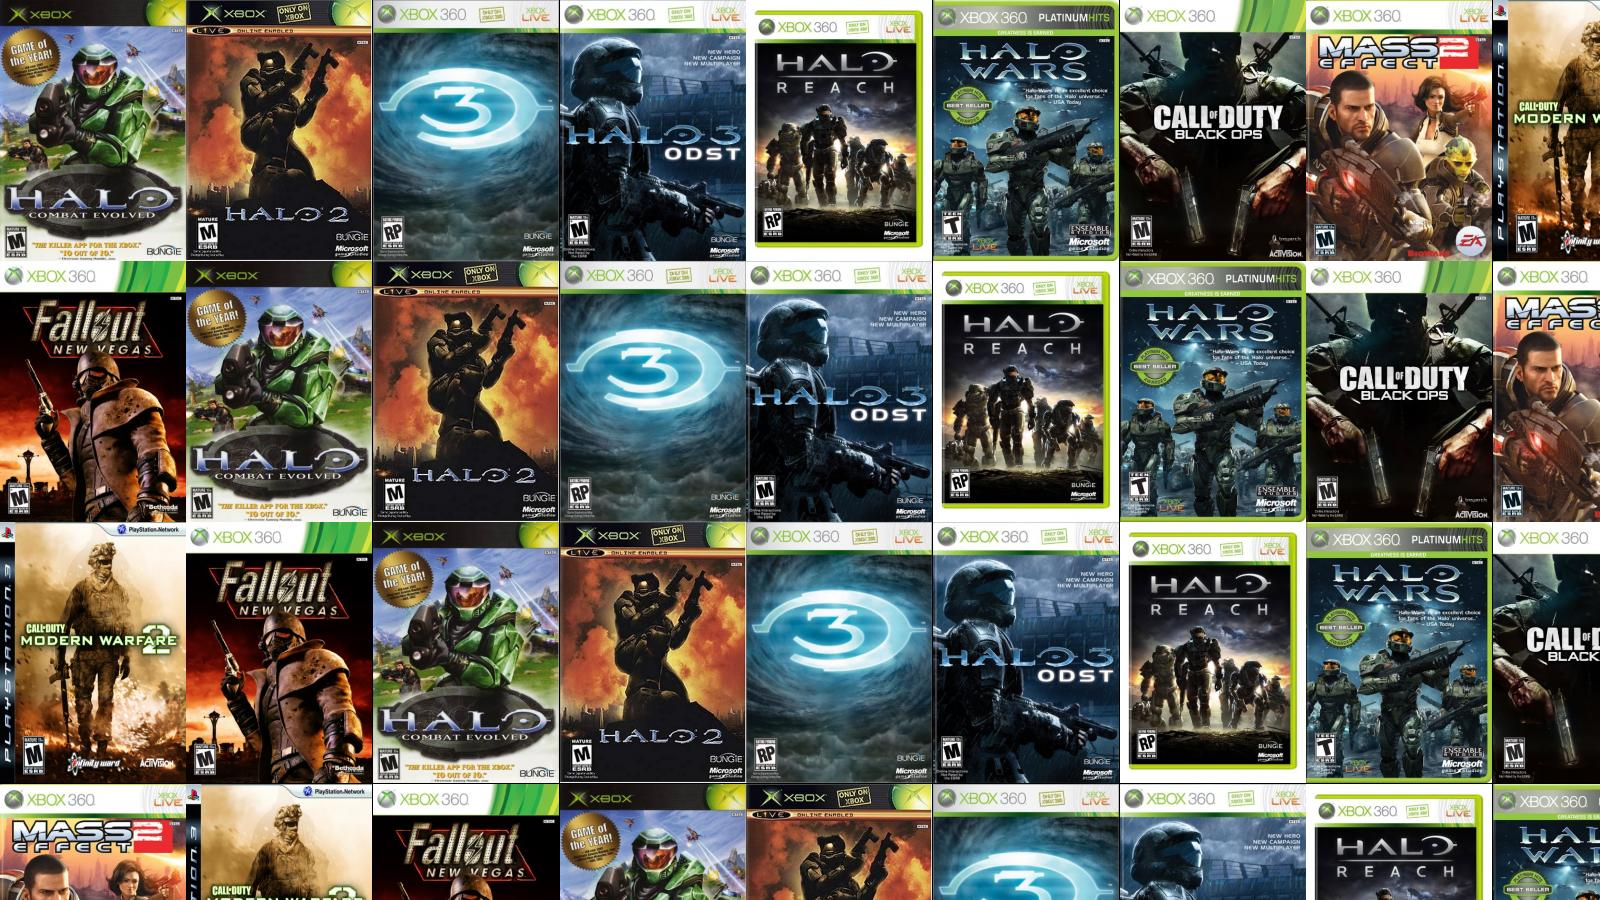 Halo Combat Evolved Halo 2 Halo 3 Halo Wallpaper « Tiled